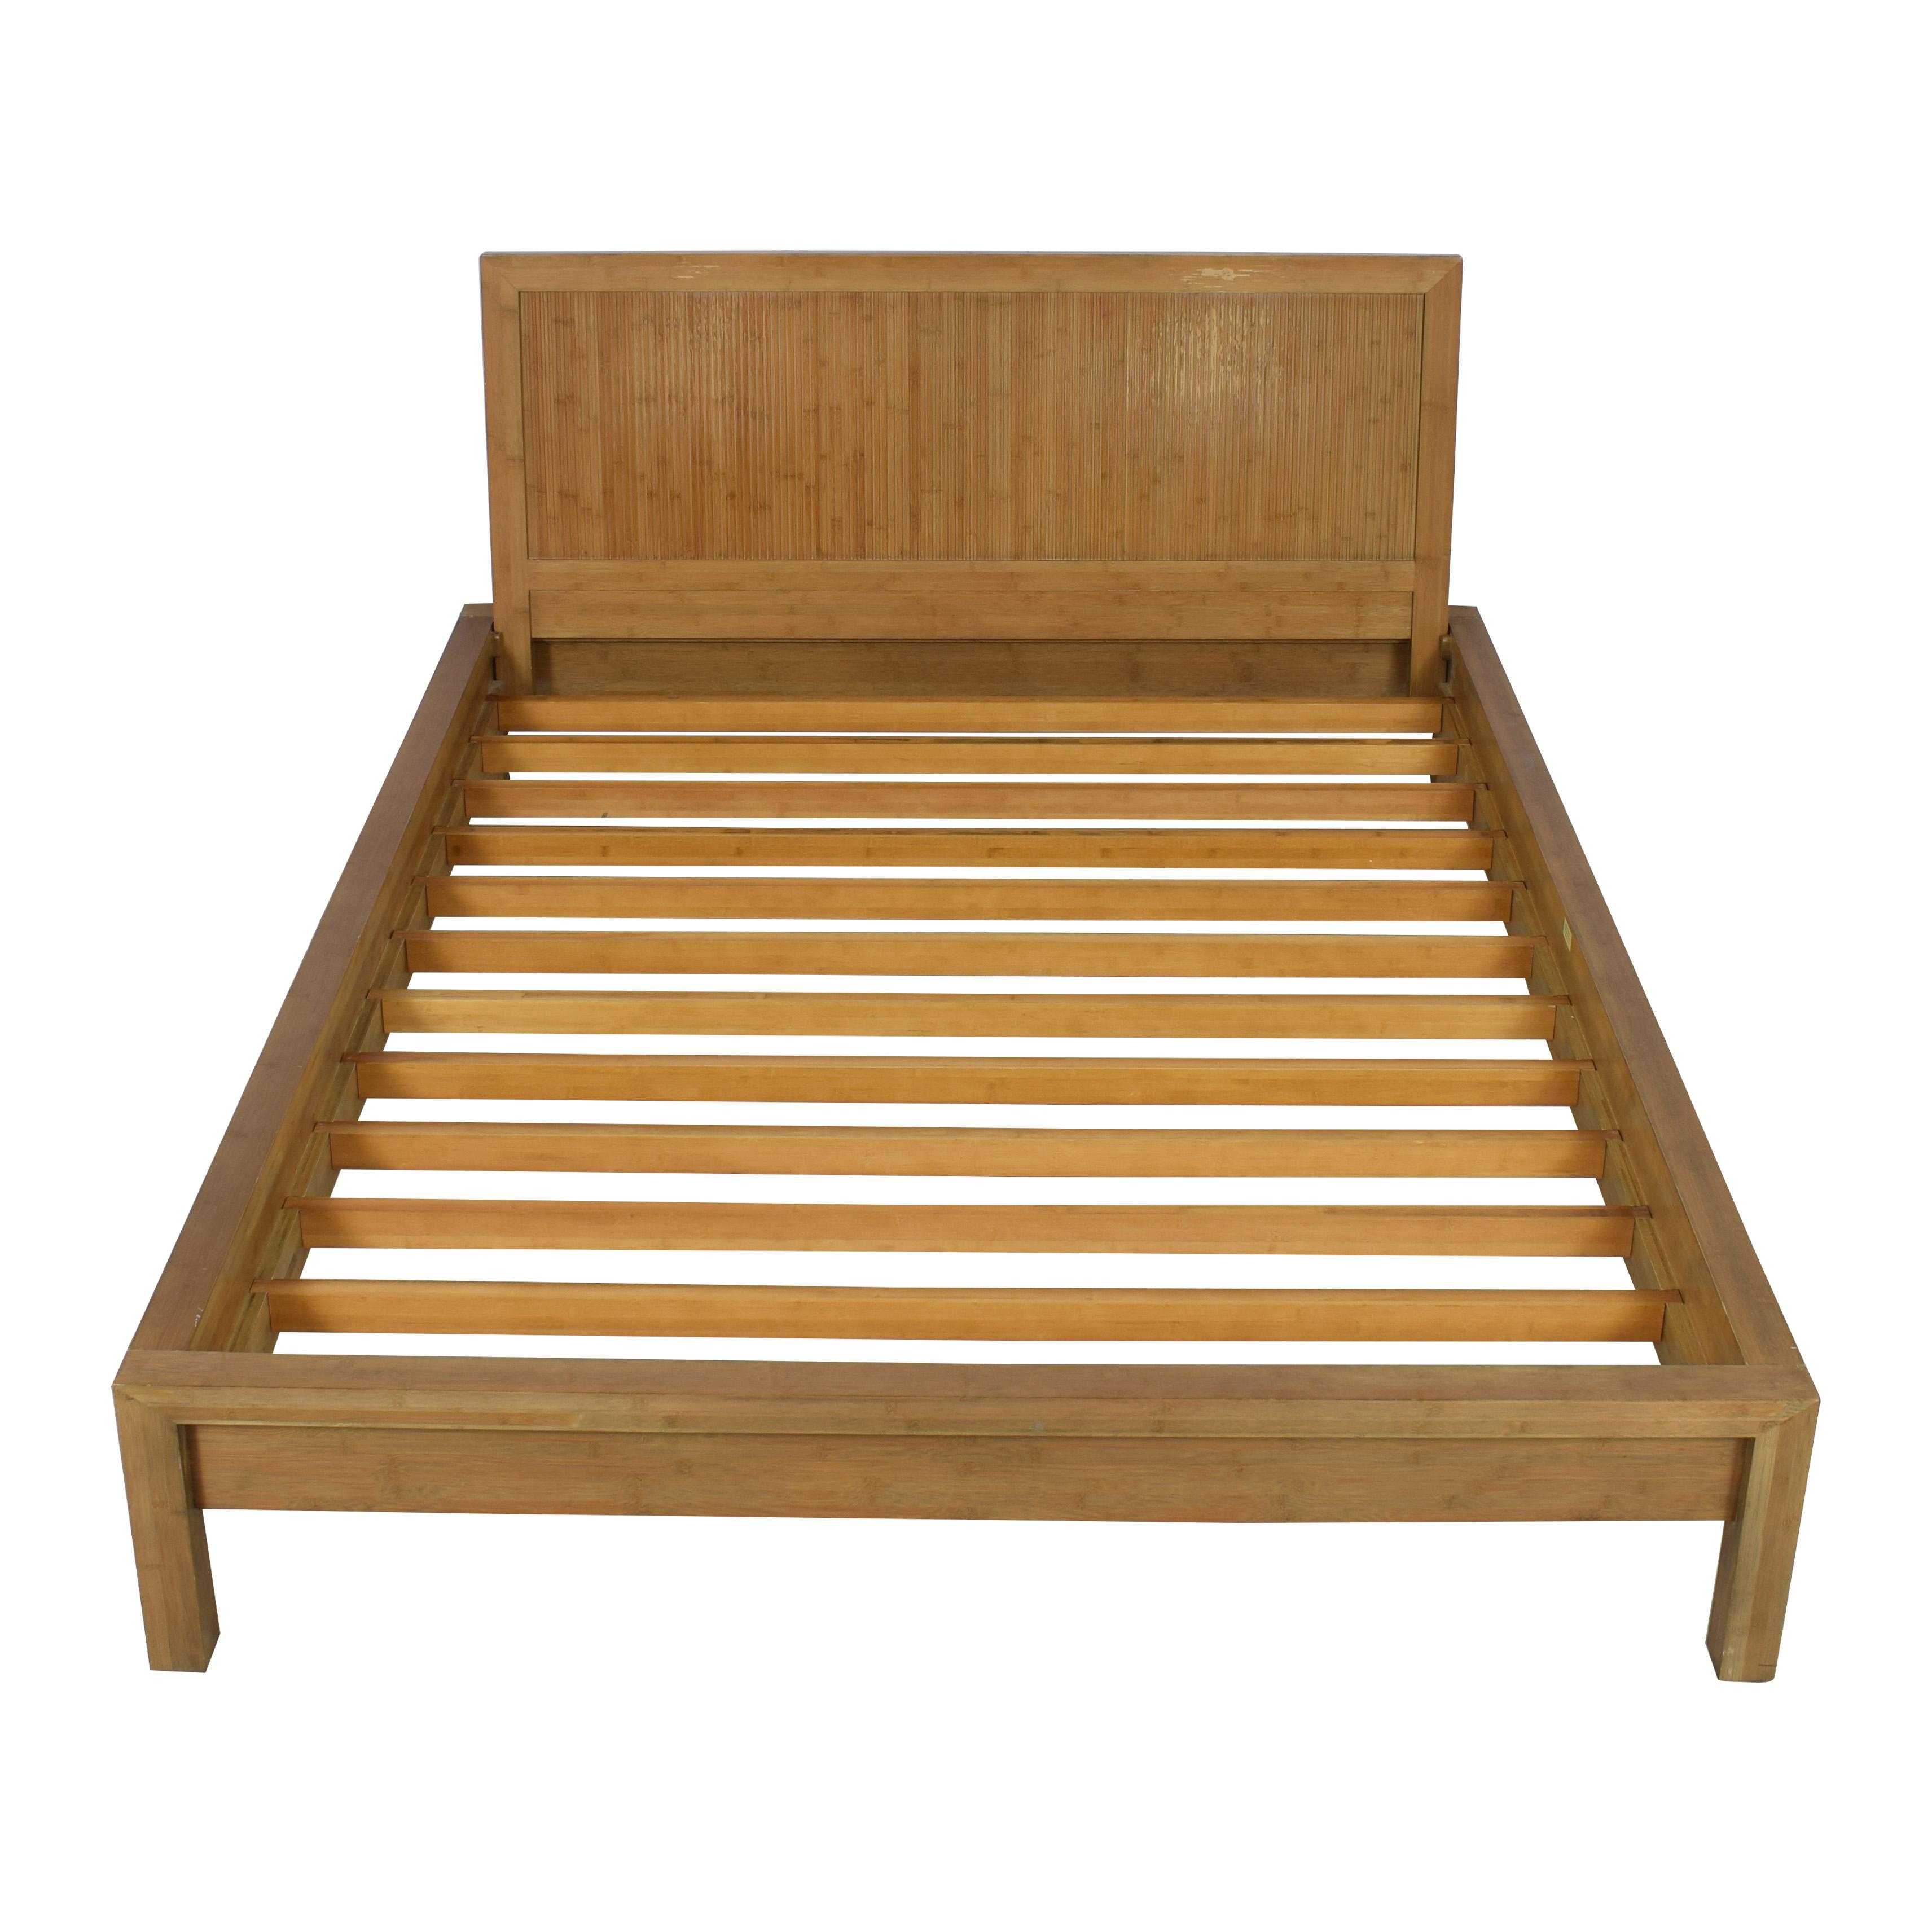 63 Off Room Board Room Board Queen Bamboo Timbre Maria Yee Platform Bed Beds